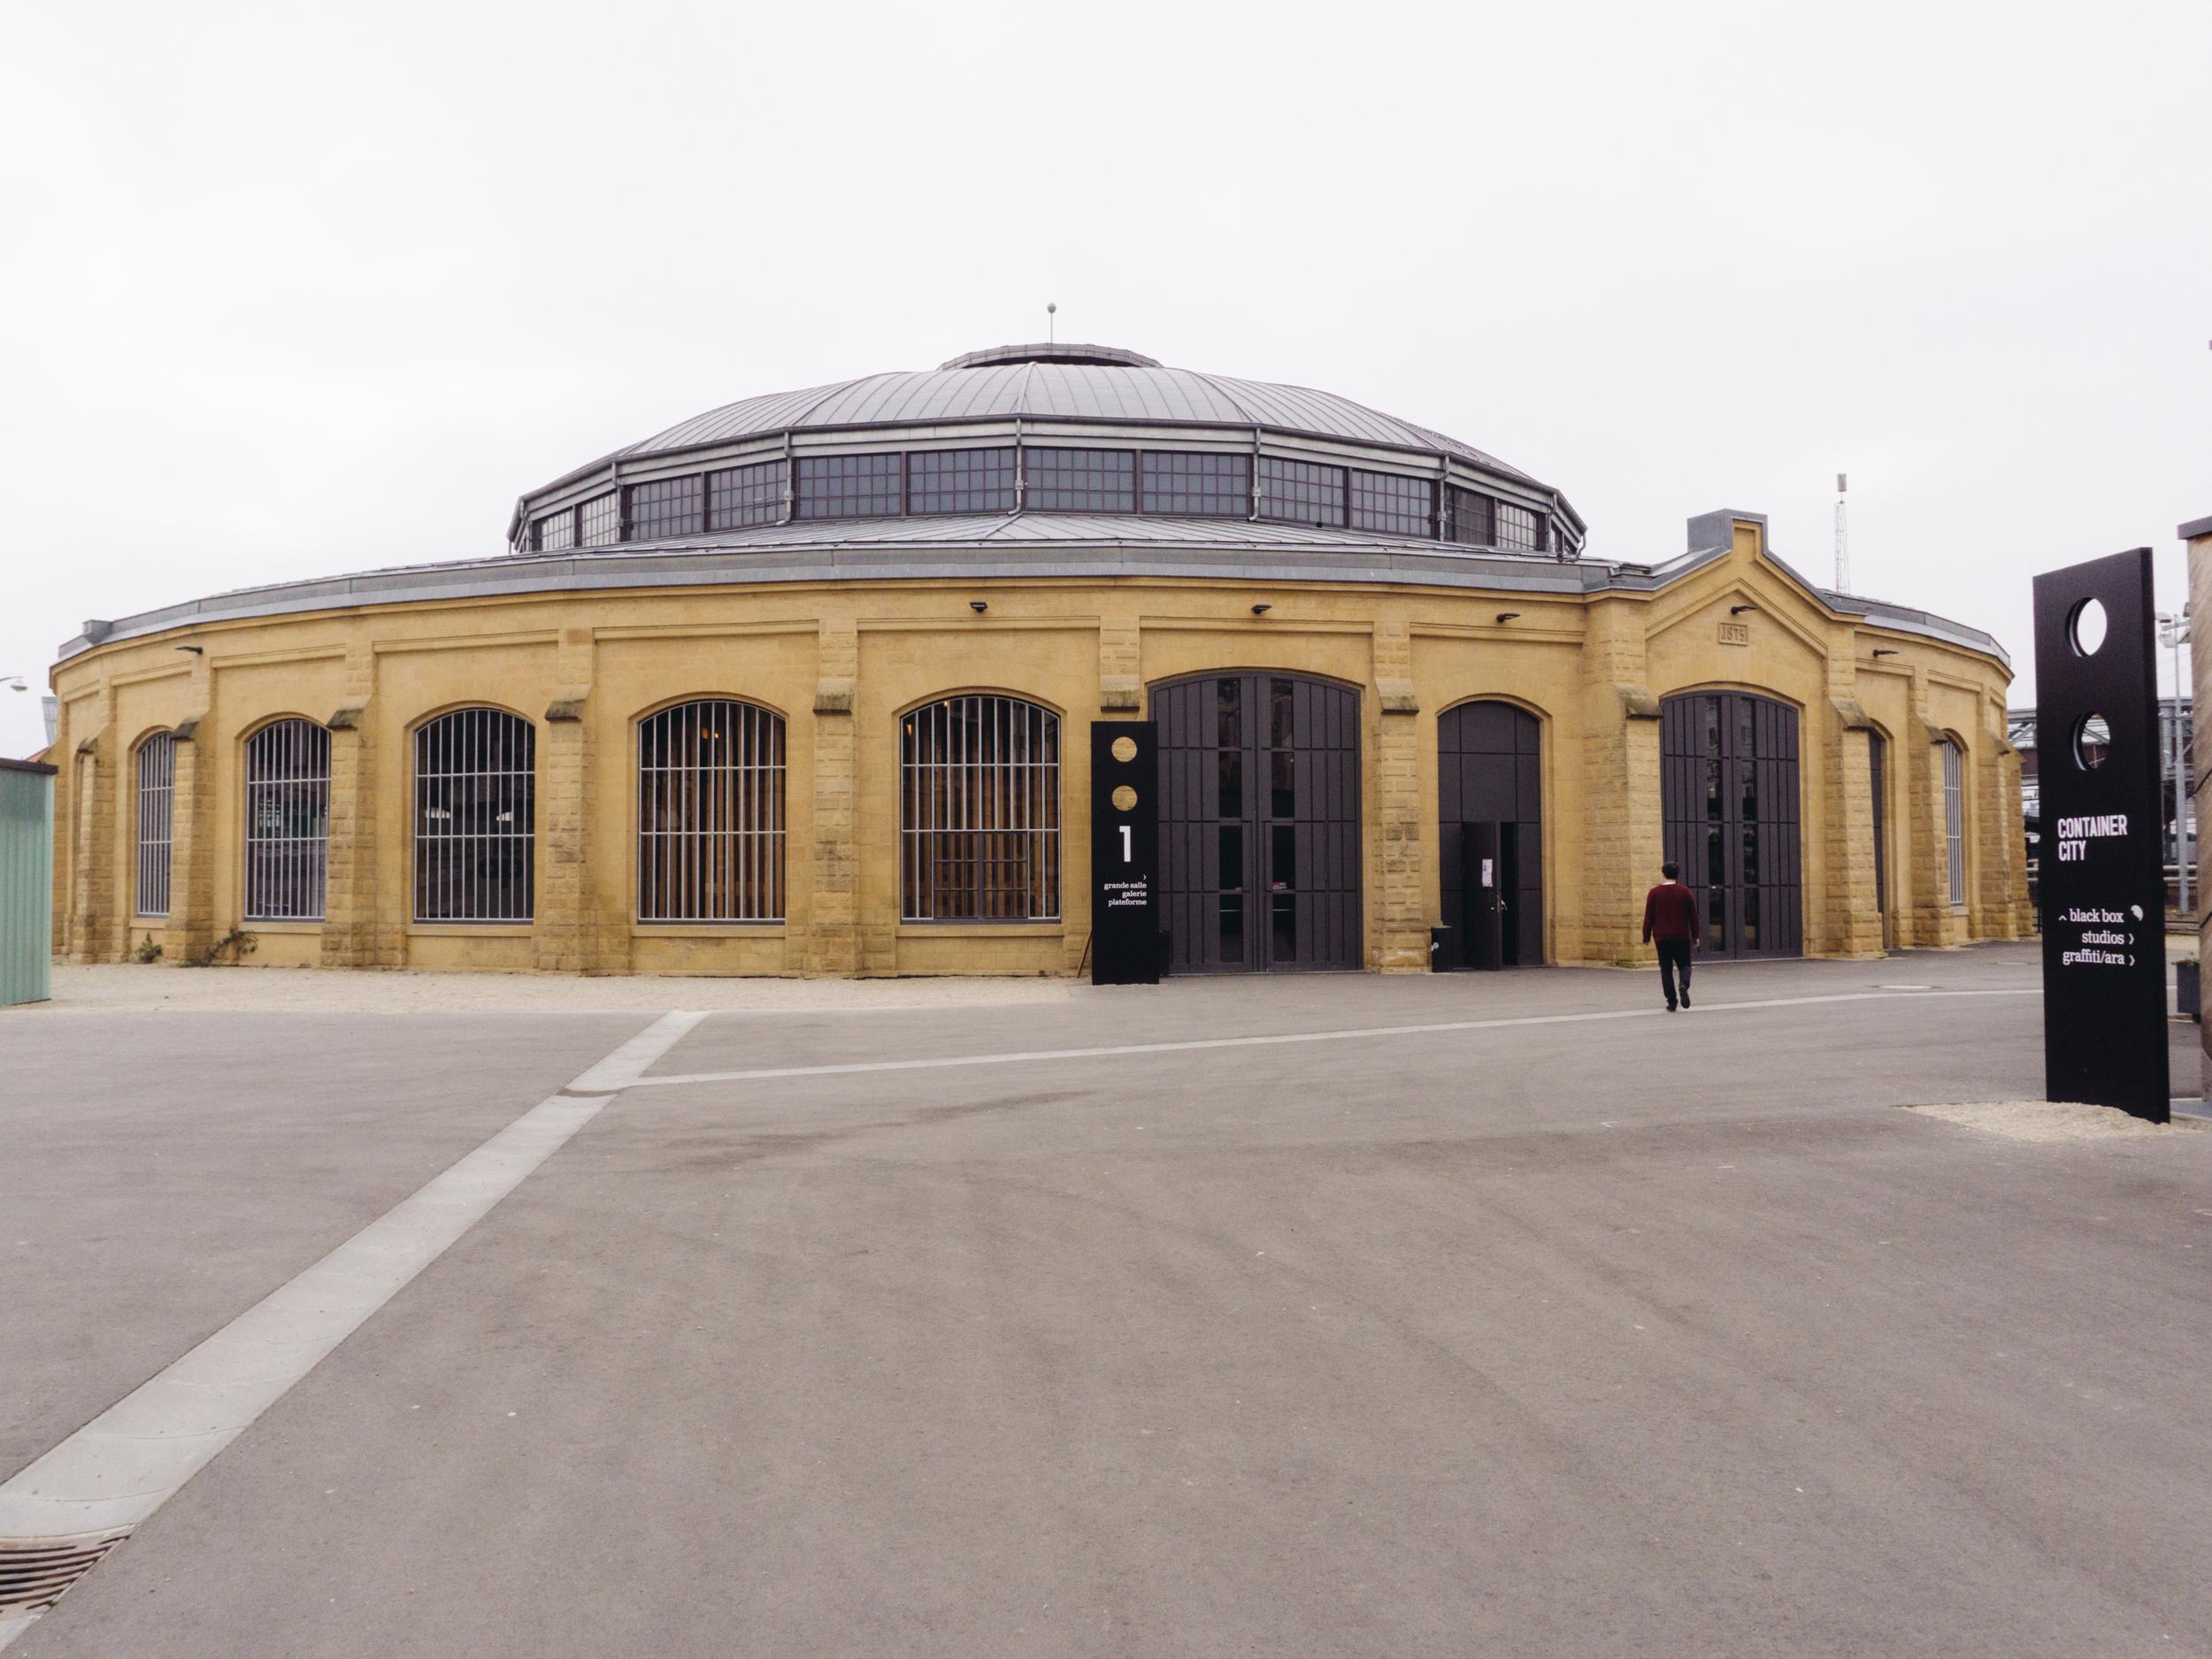 Centre de création artistique les Rotondes , donde realizamos el evento.